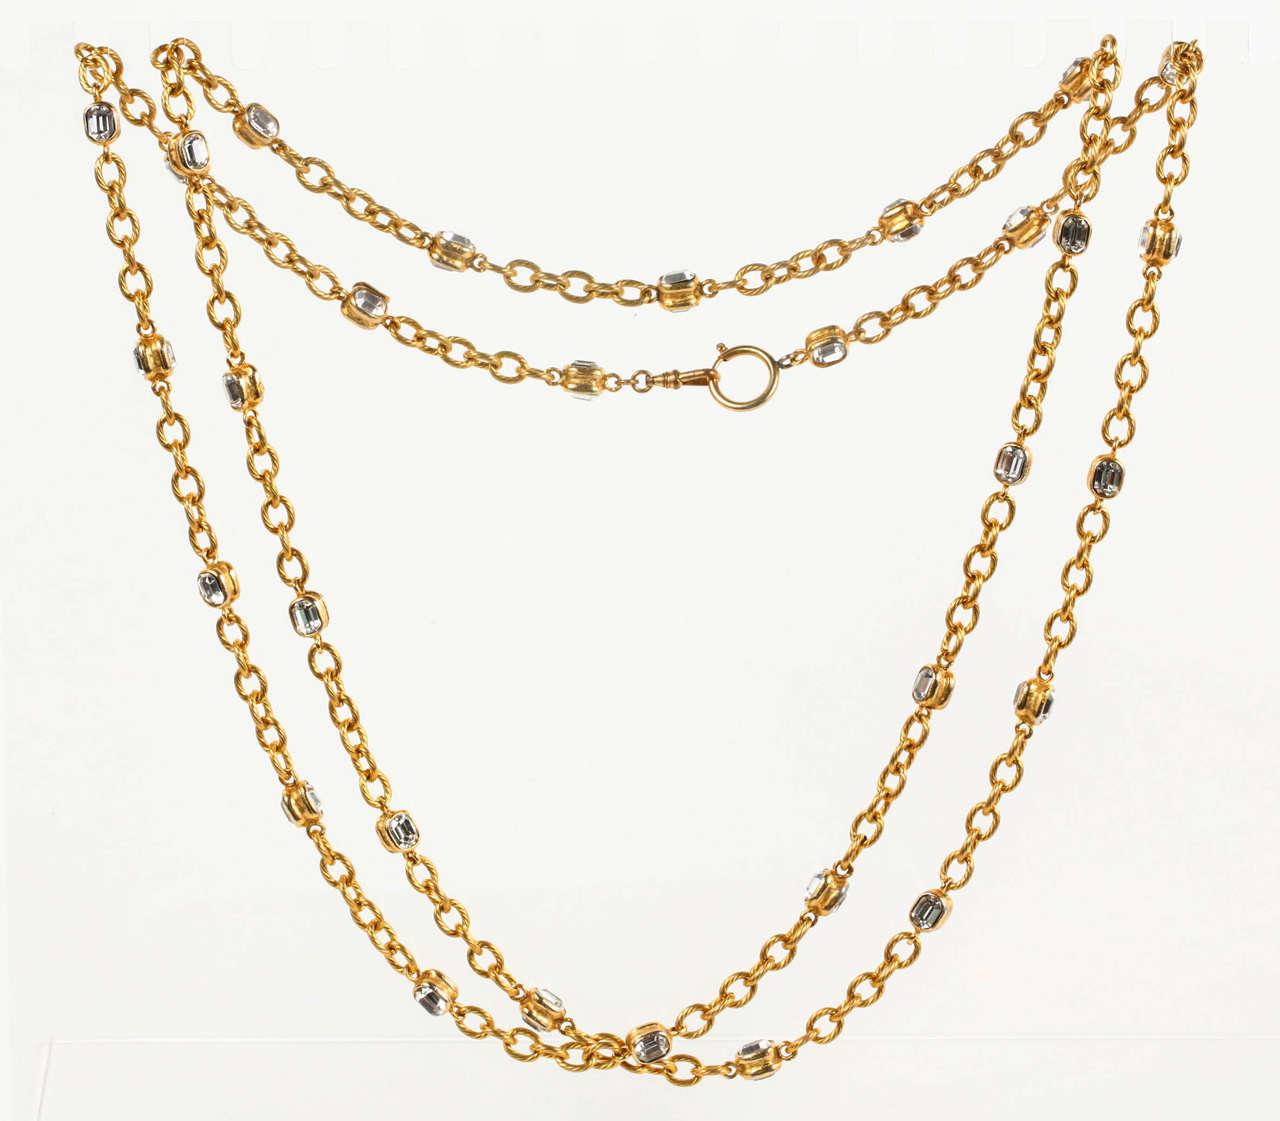 Chanel Gold Chain and Crystal Sautoir 2